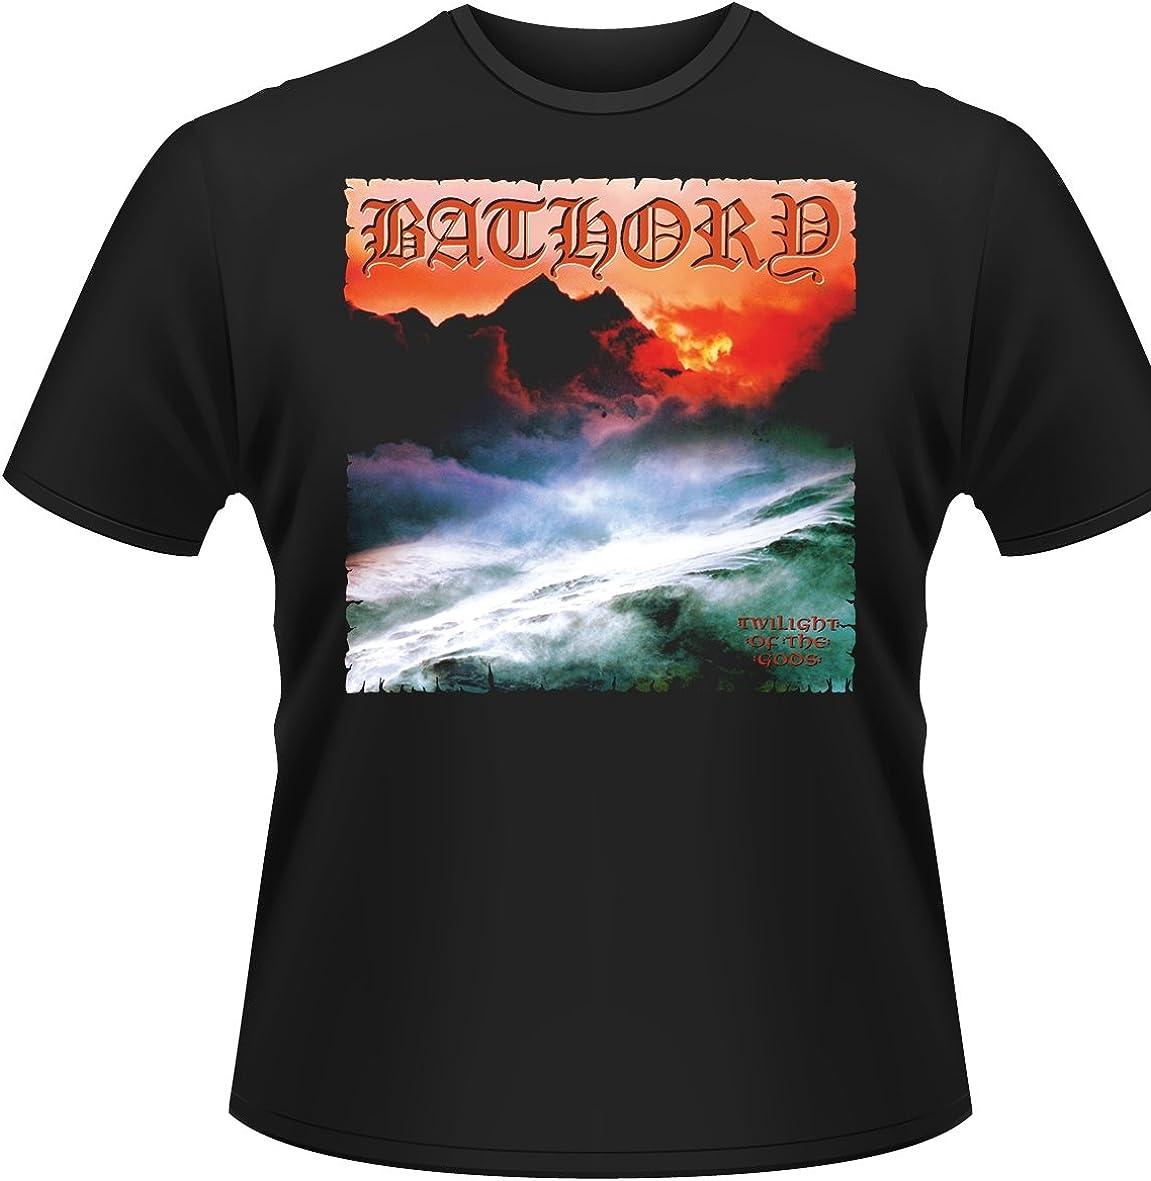 Bathory /'Twilight Of The Gods/' T-Shirt NEW /& OFFICIAL